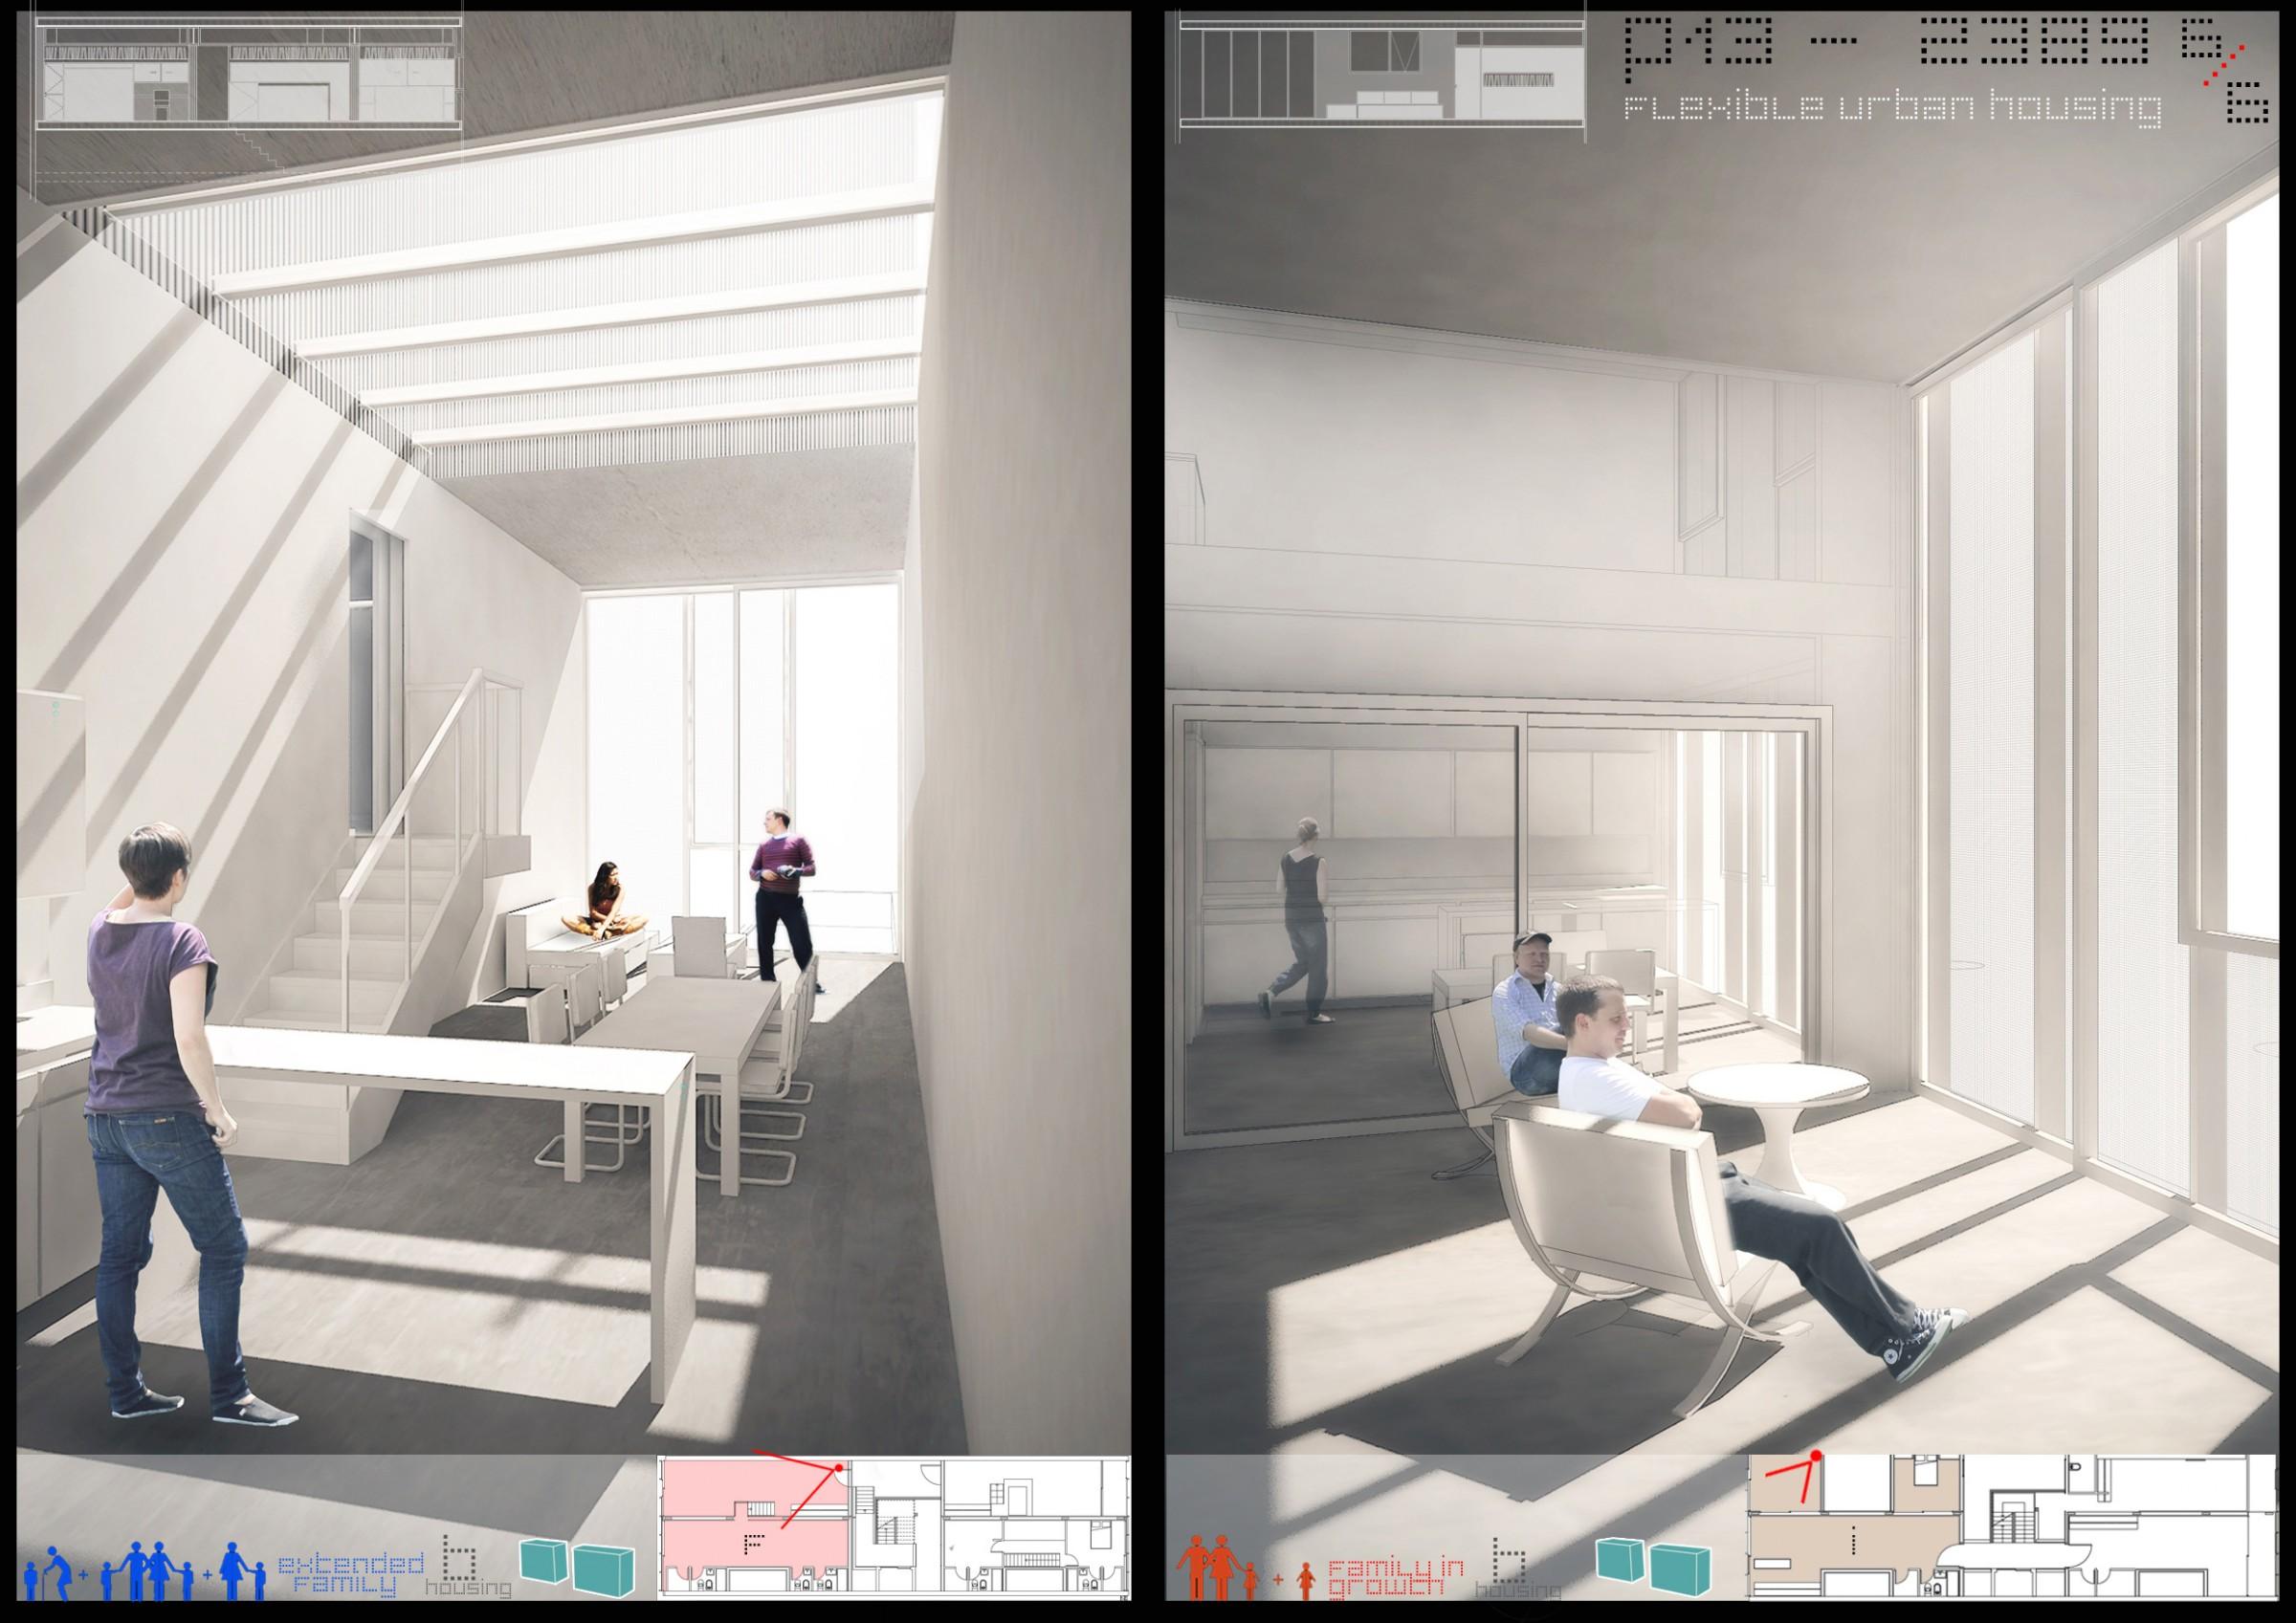 Archiprix 2013 Flexible Urban Housing